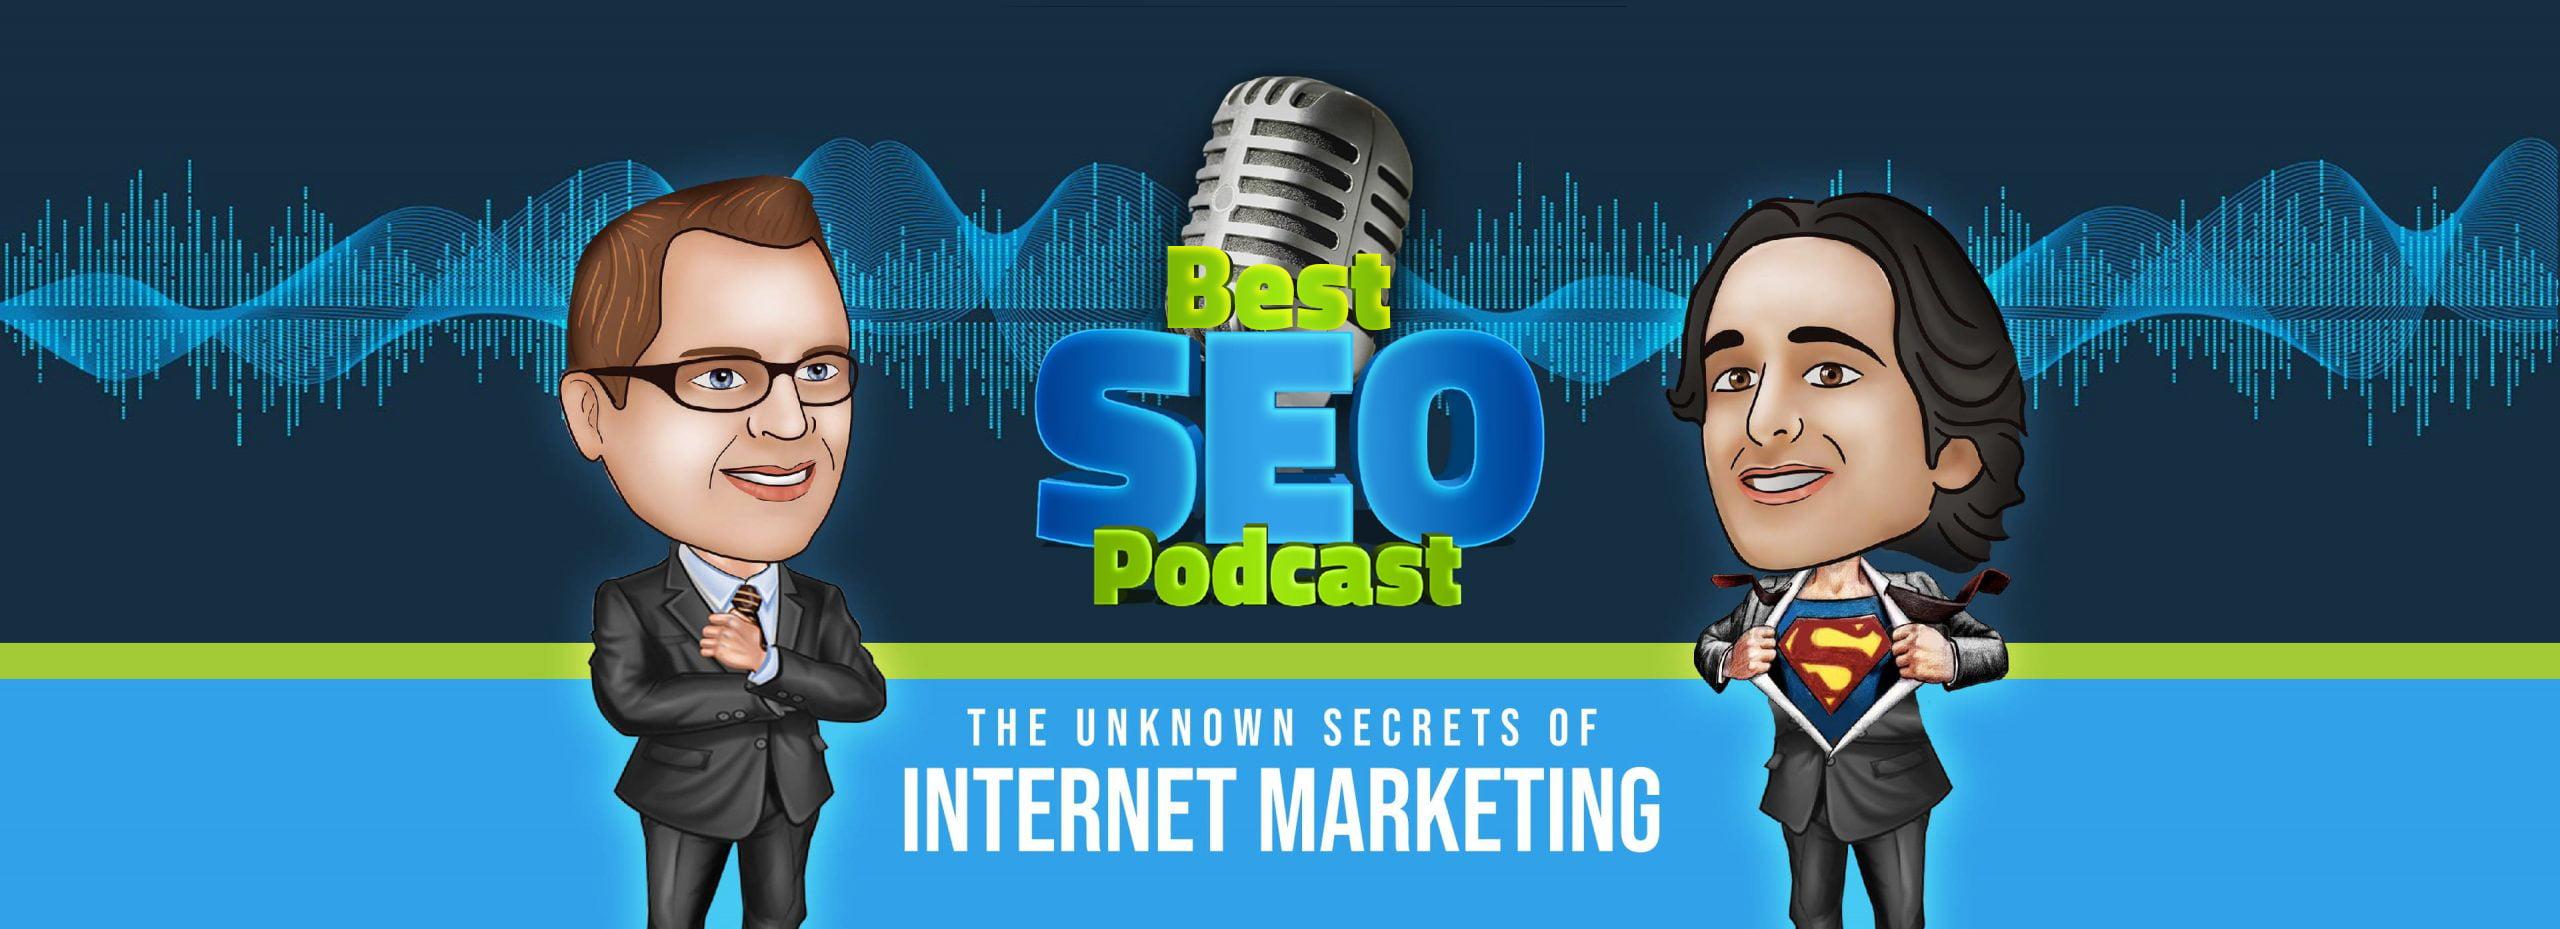 Best SEO Podcast | EWR Digital